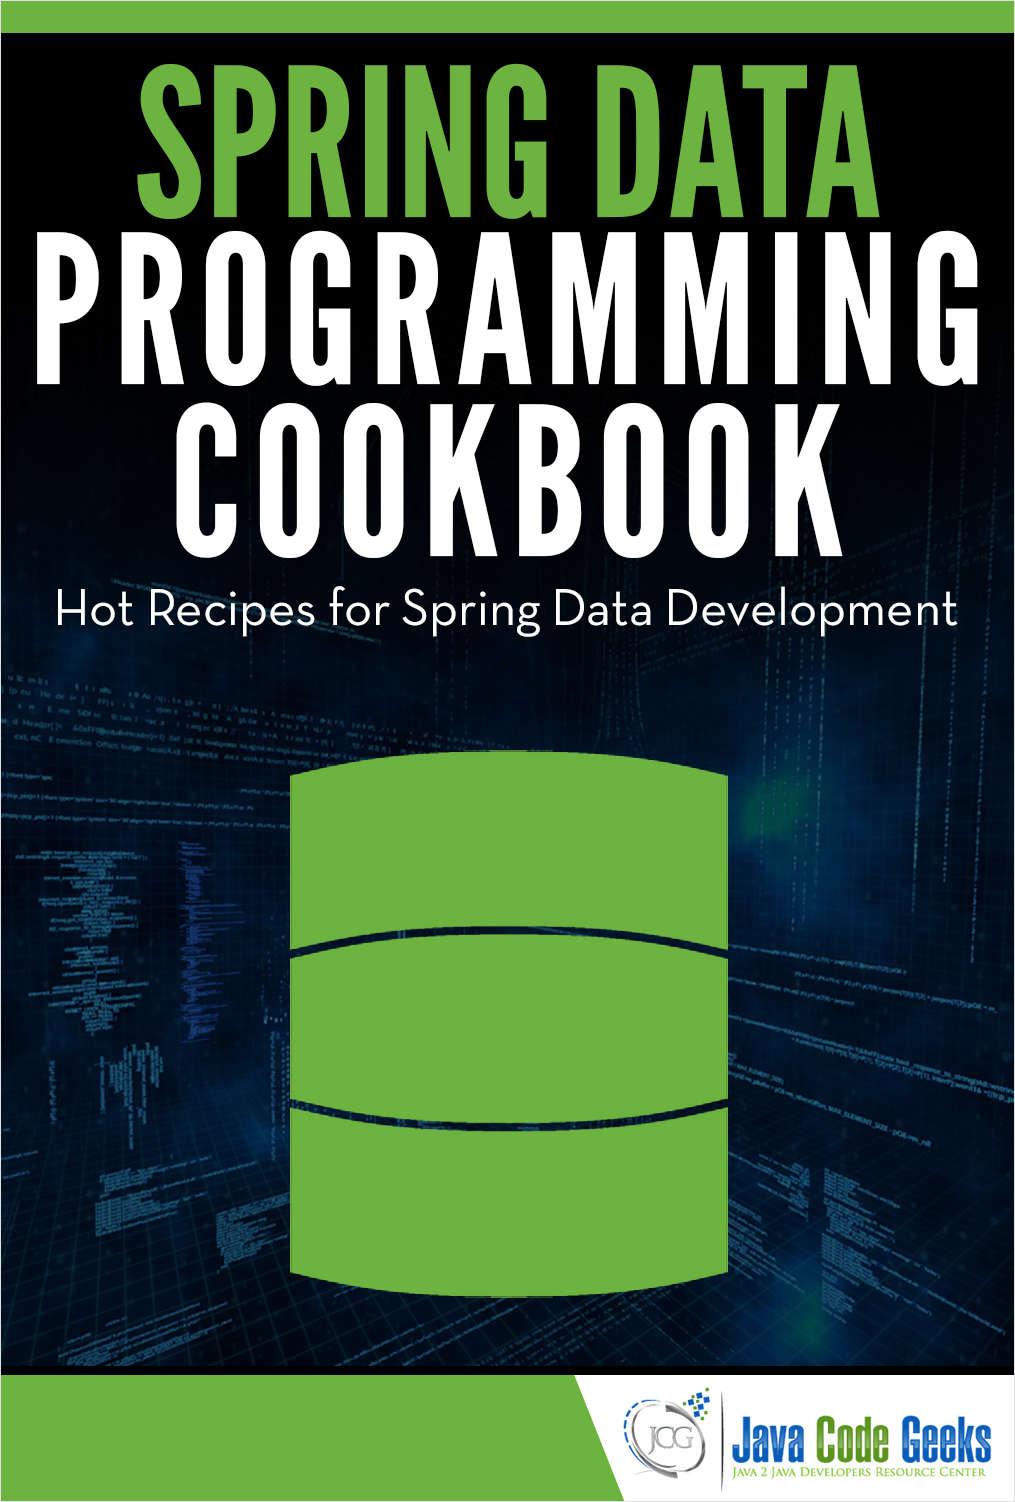 Spring Data Programming Cookbook